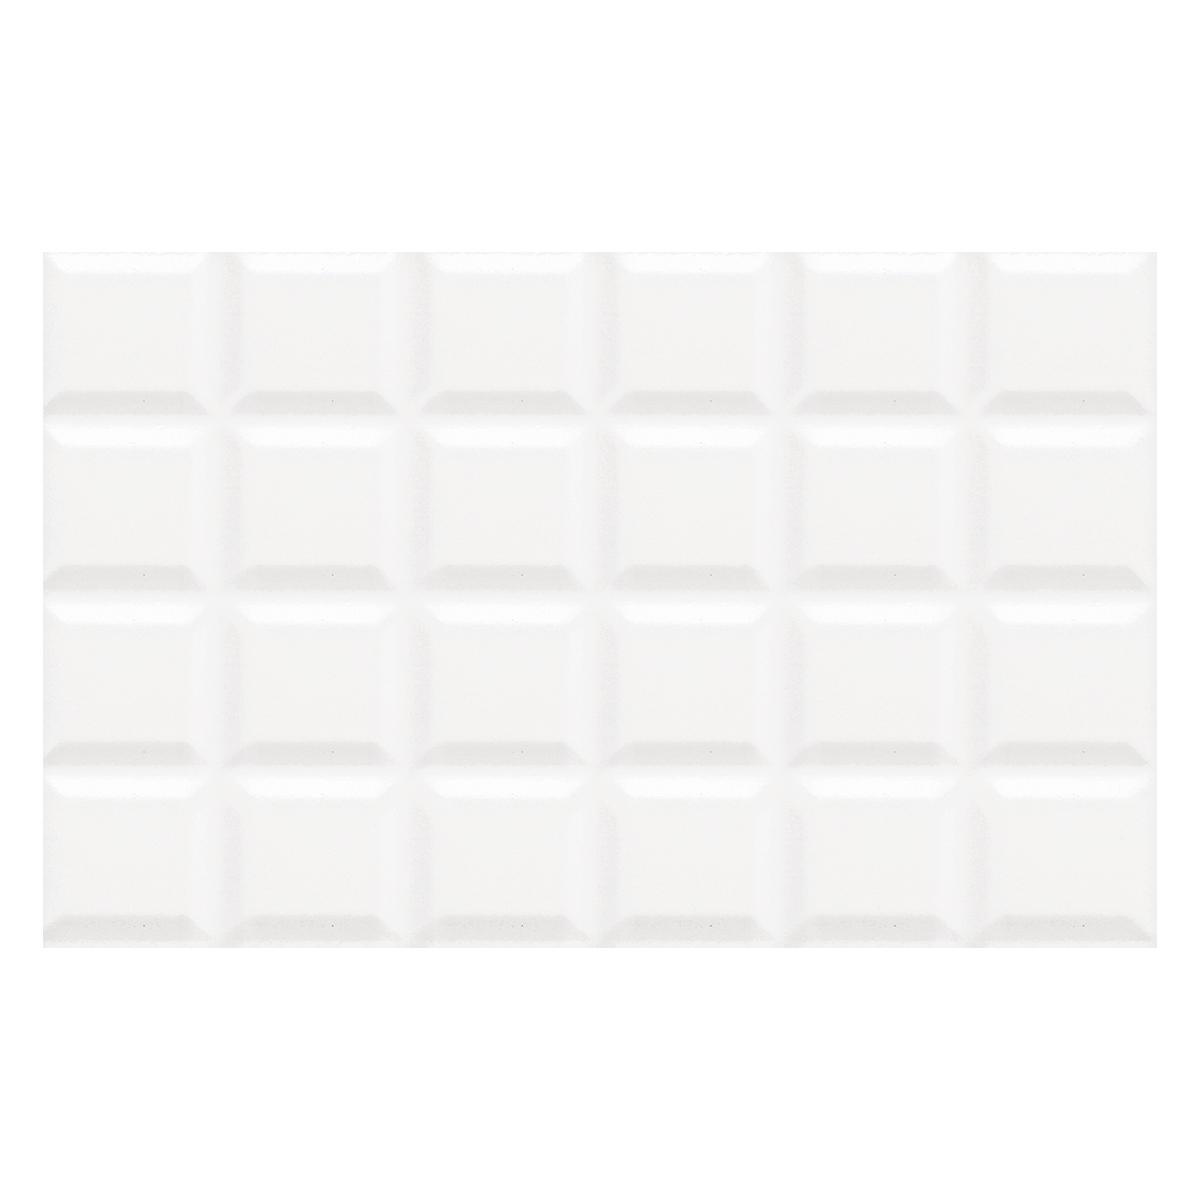 Mayólica Kali Blanco Brillante - 25X40 cm - 1.83 m2